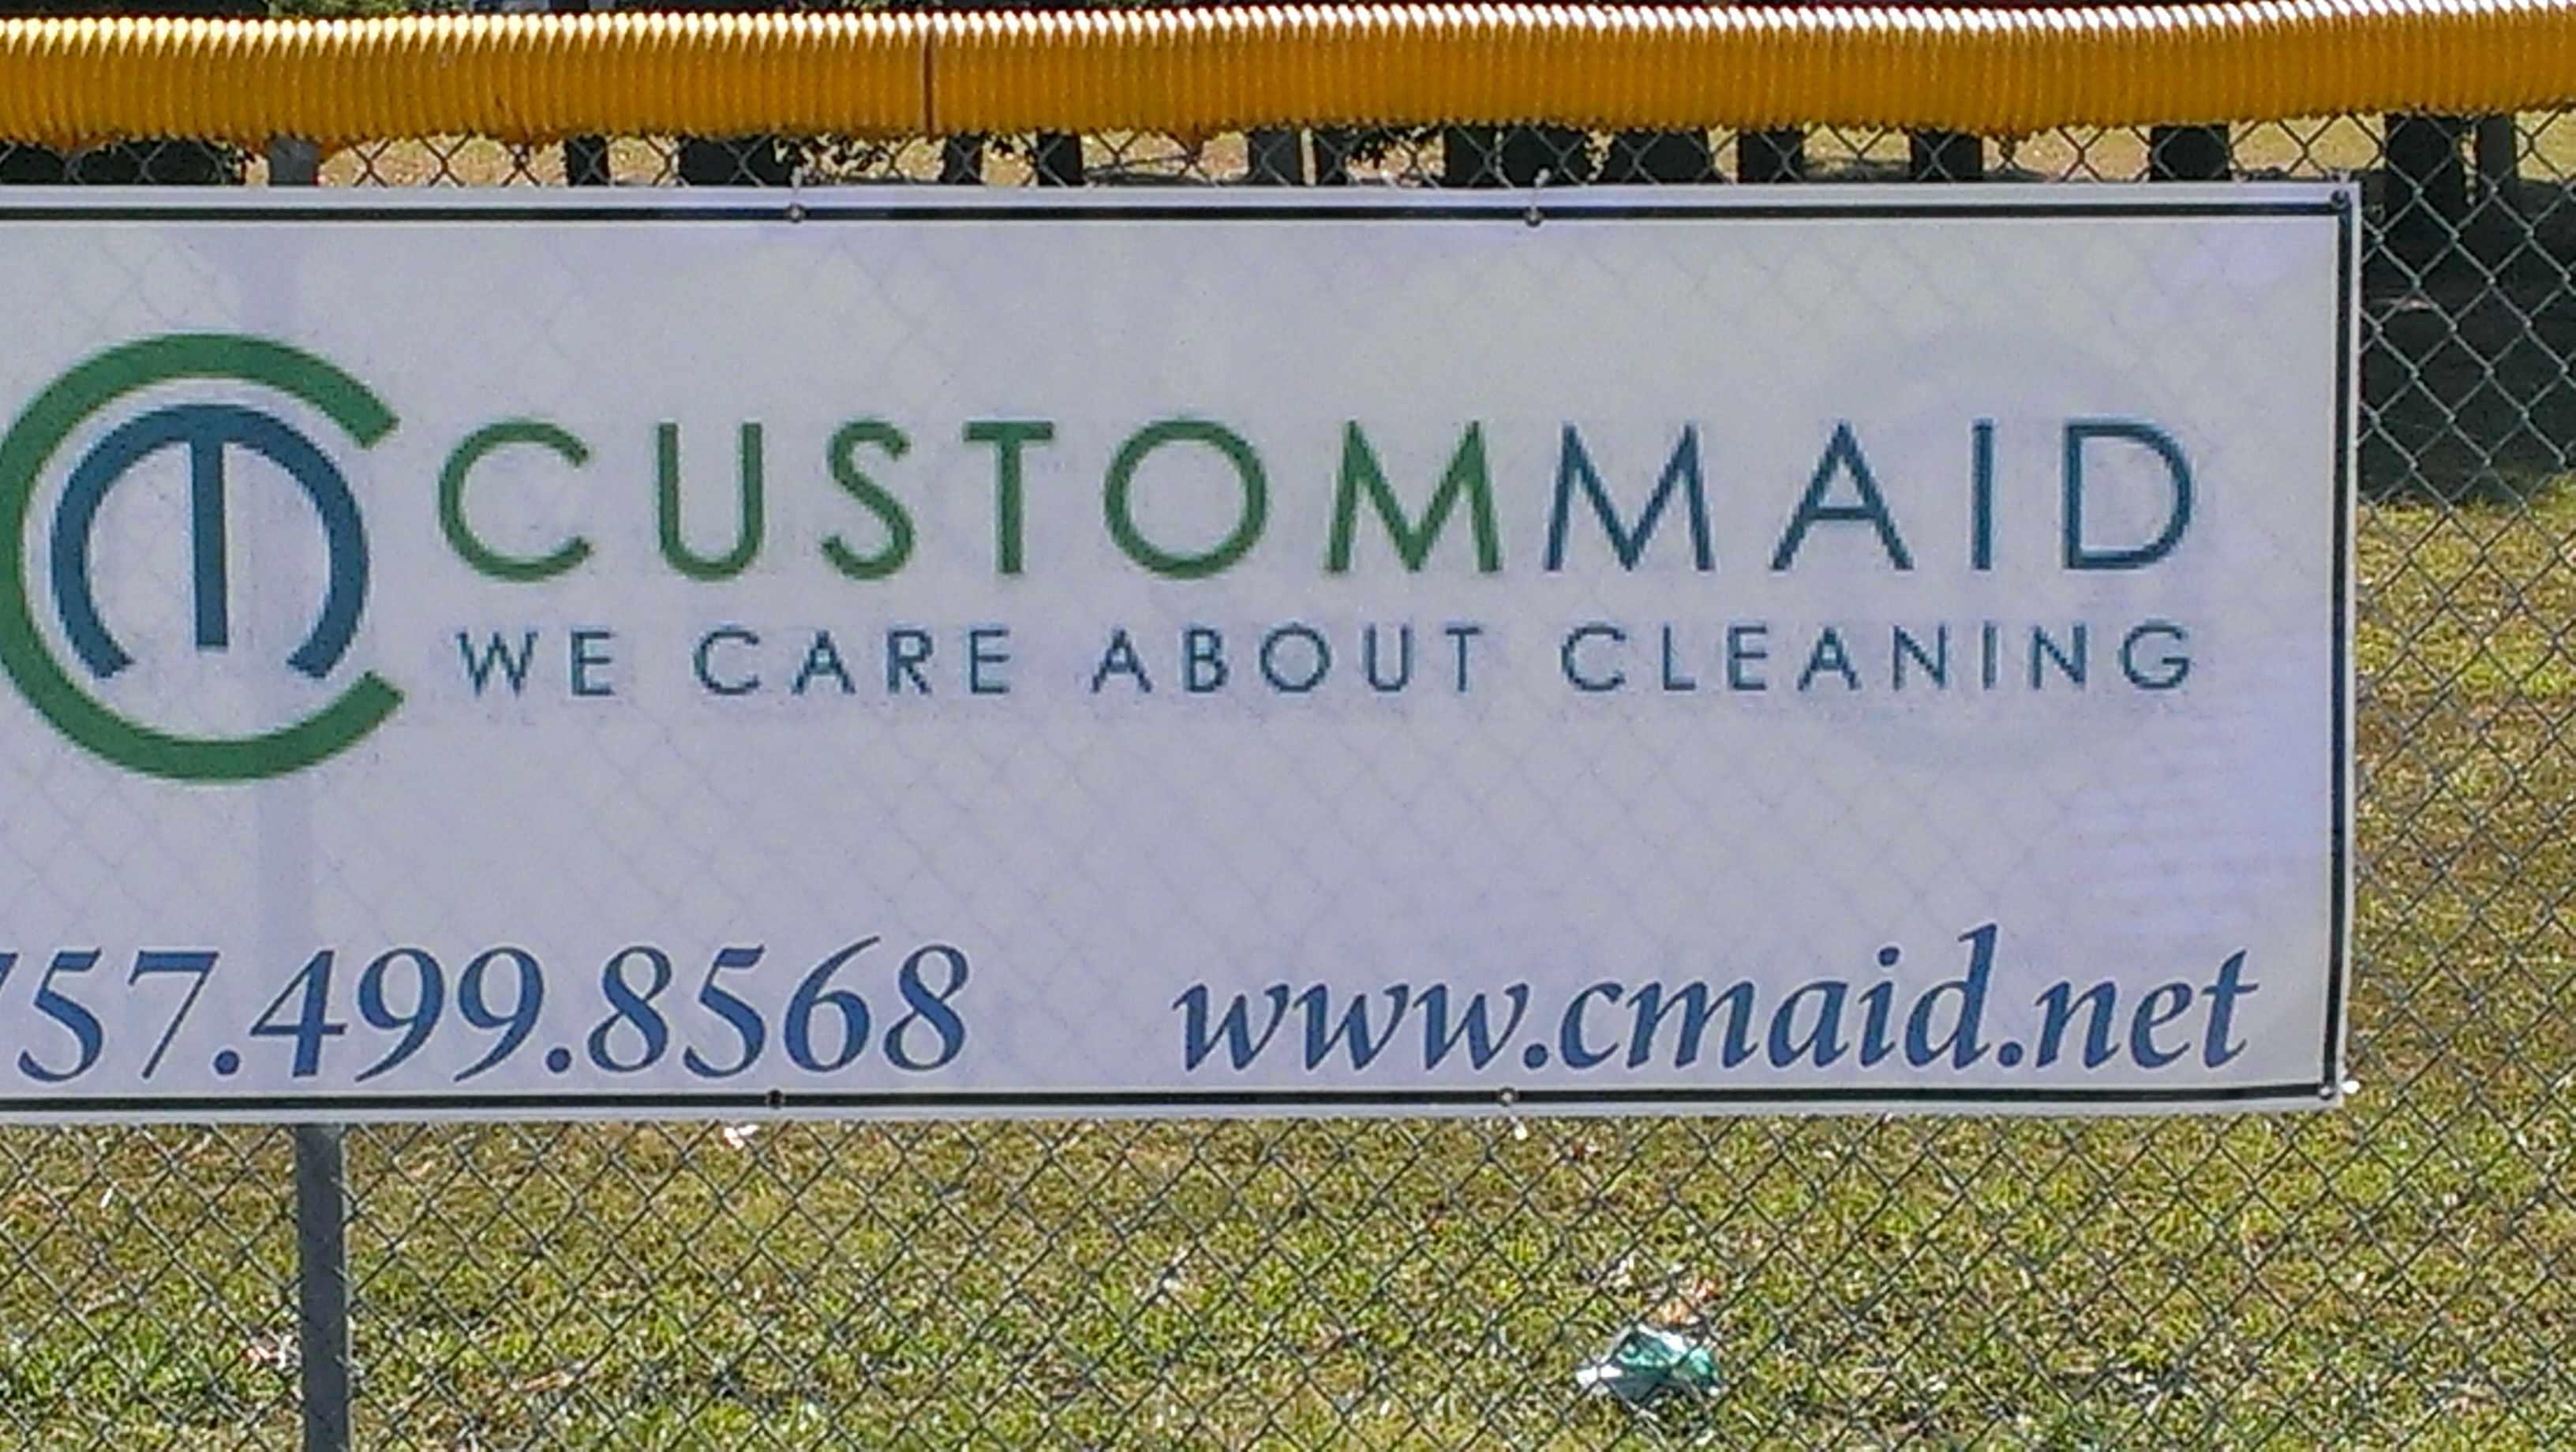 CustomMaid banner